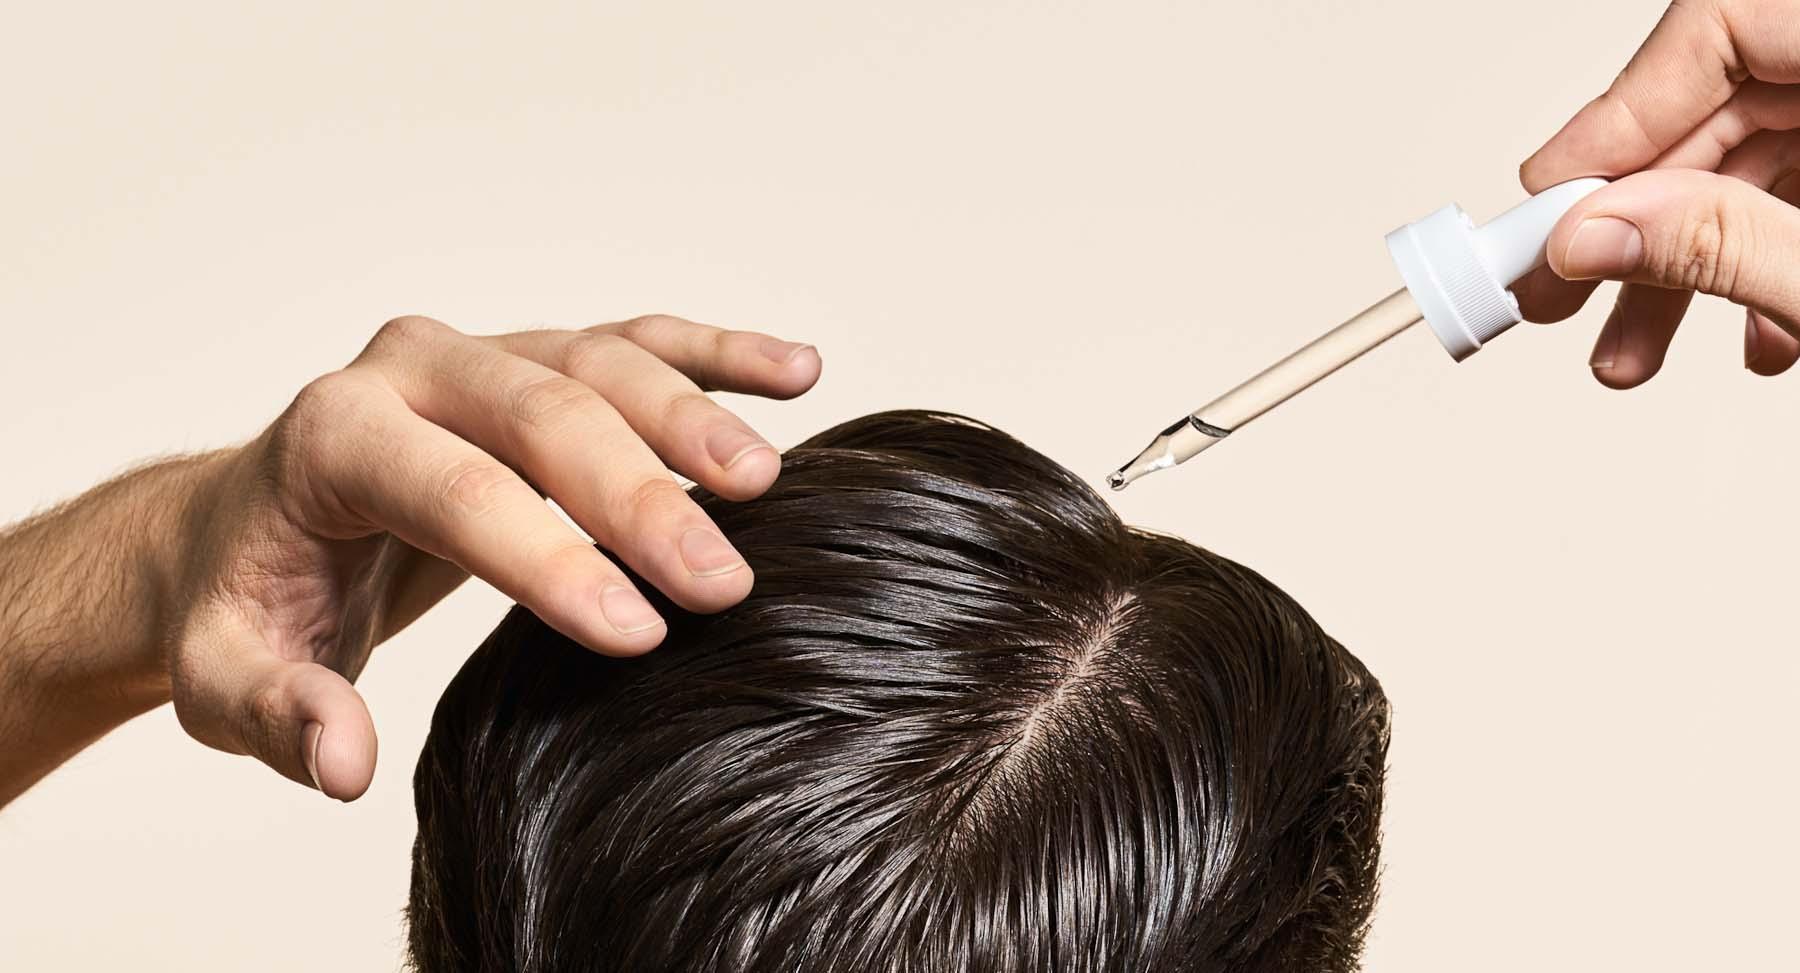 Advanced hair transplant techniques in Hyderabad, hair transplant center near Madhapur